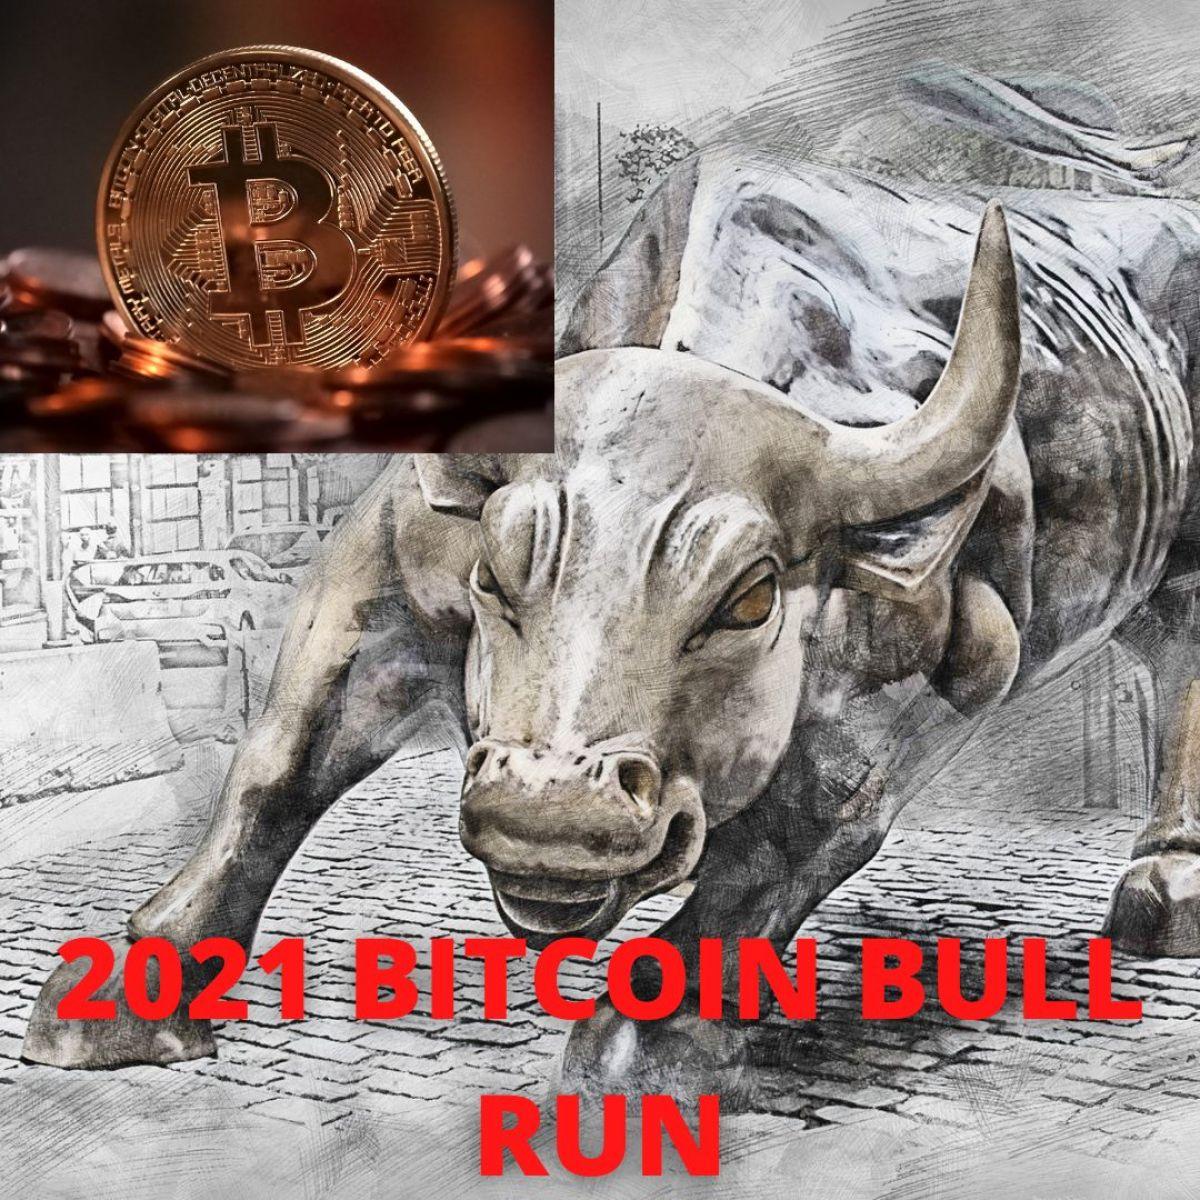 Top 5 Bitcoin Predictions for this Bull Run